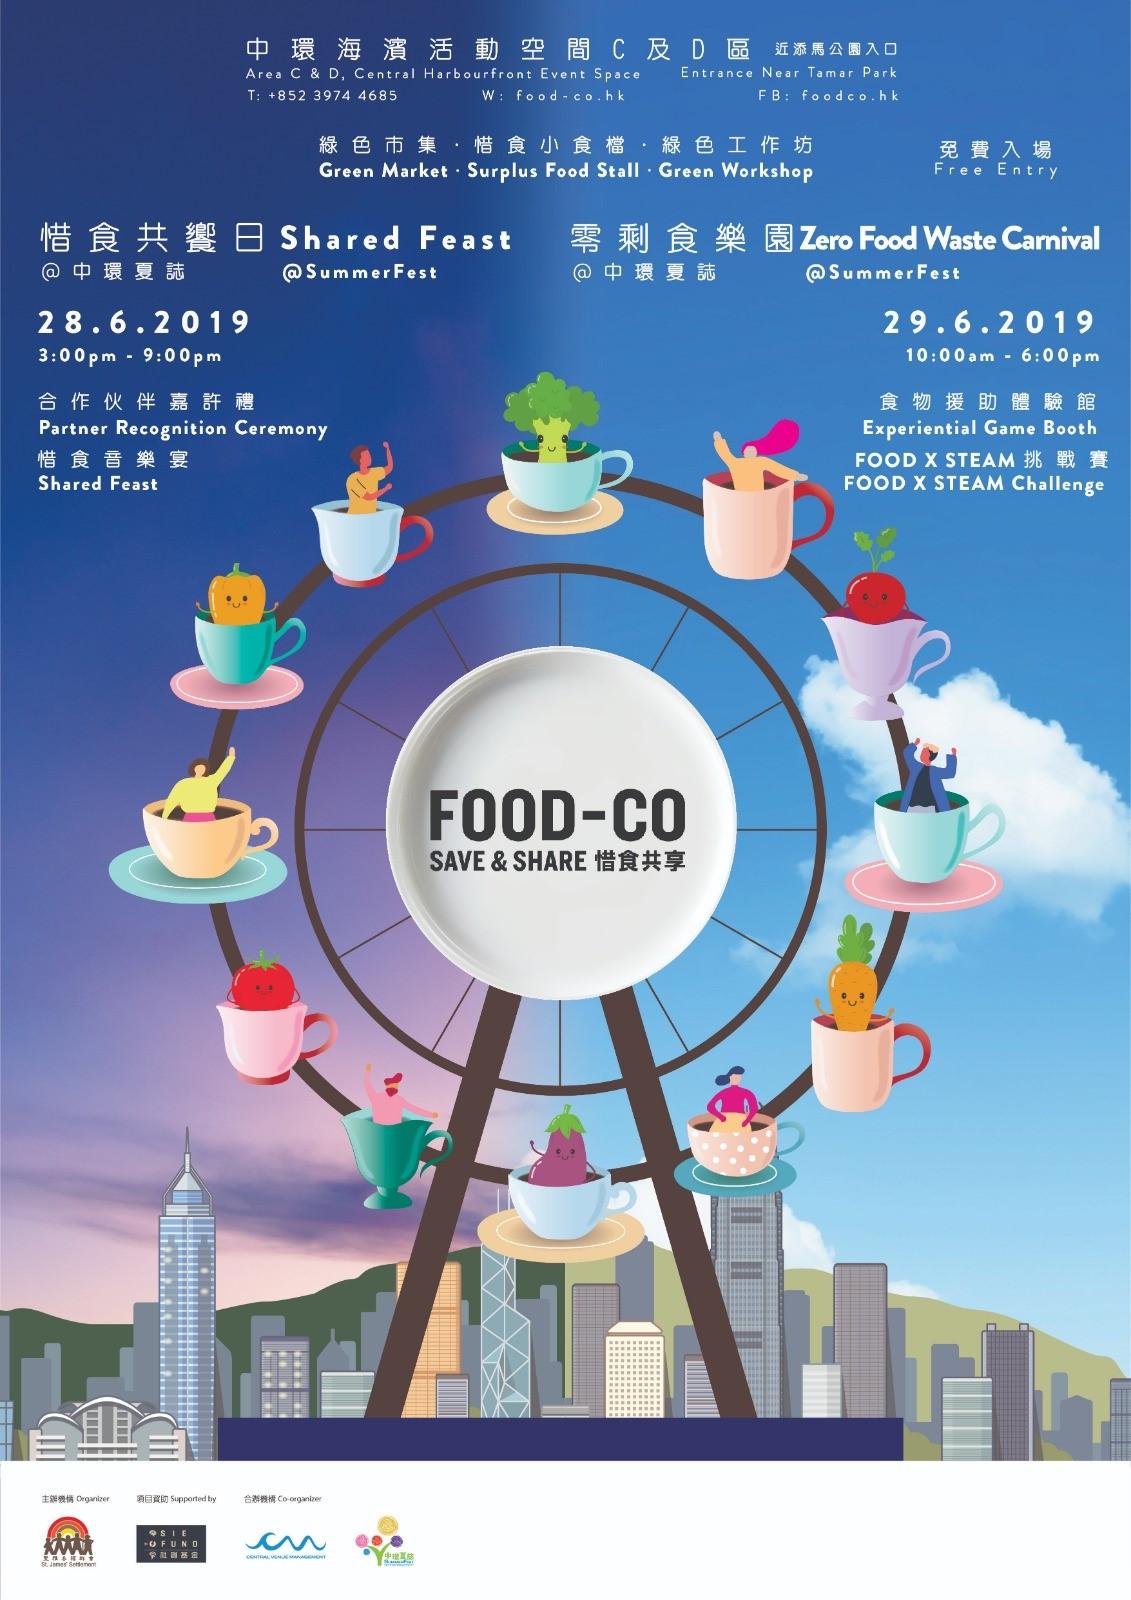 Food-Co